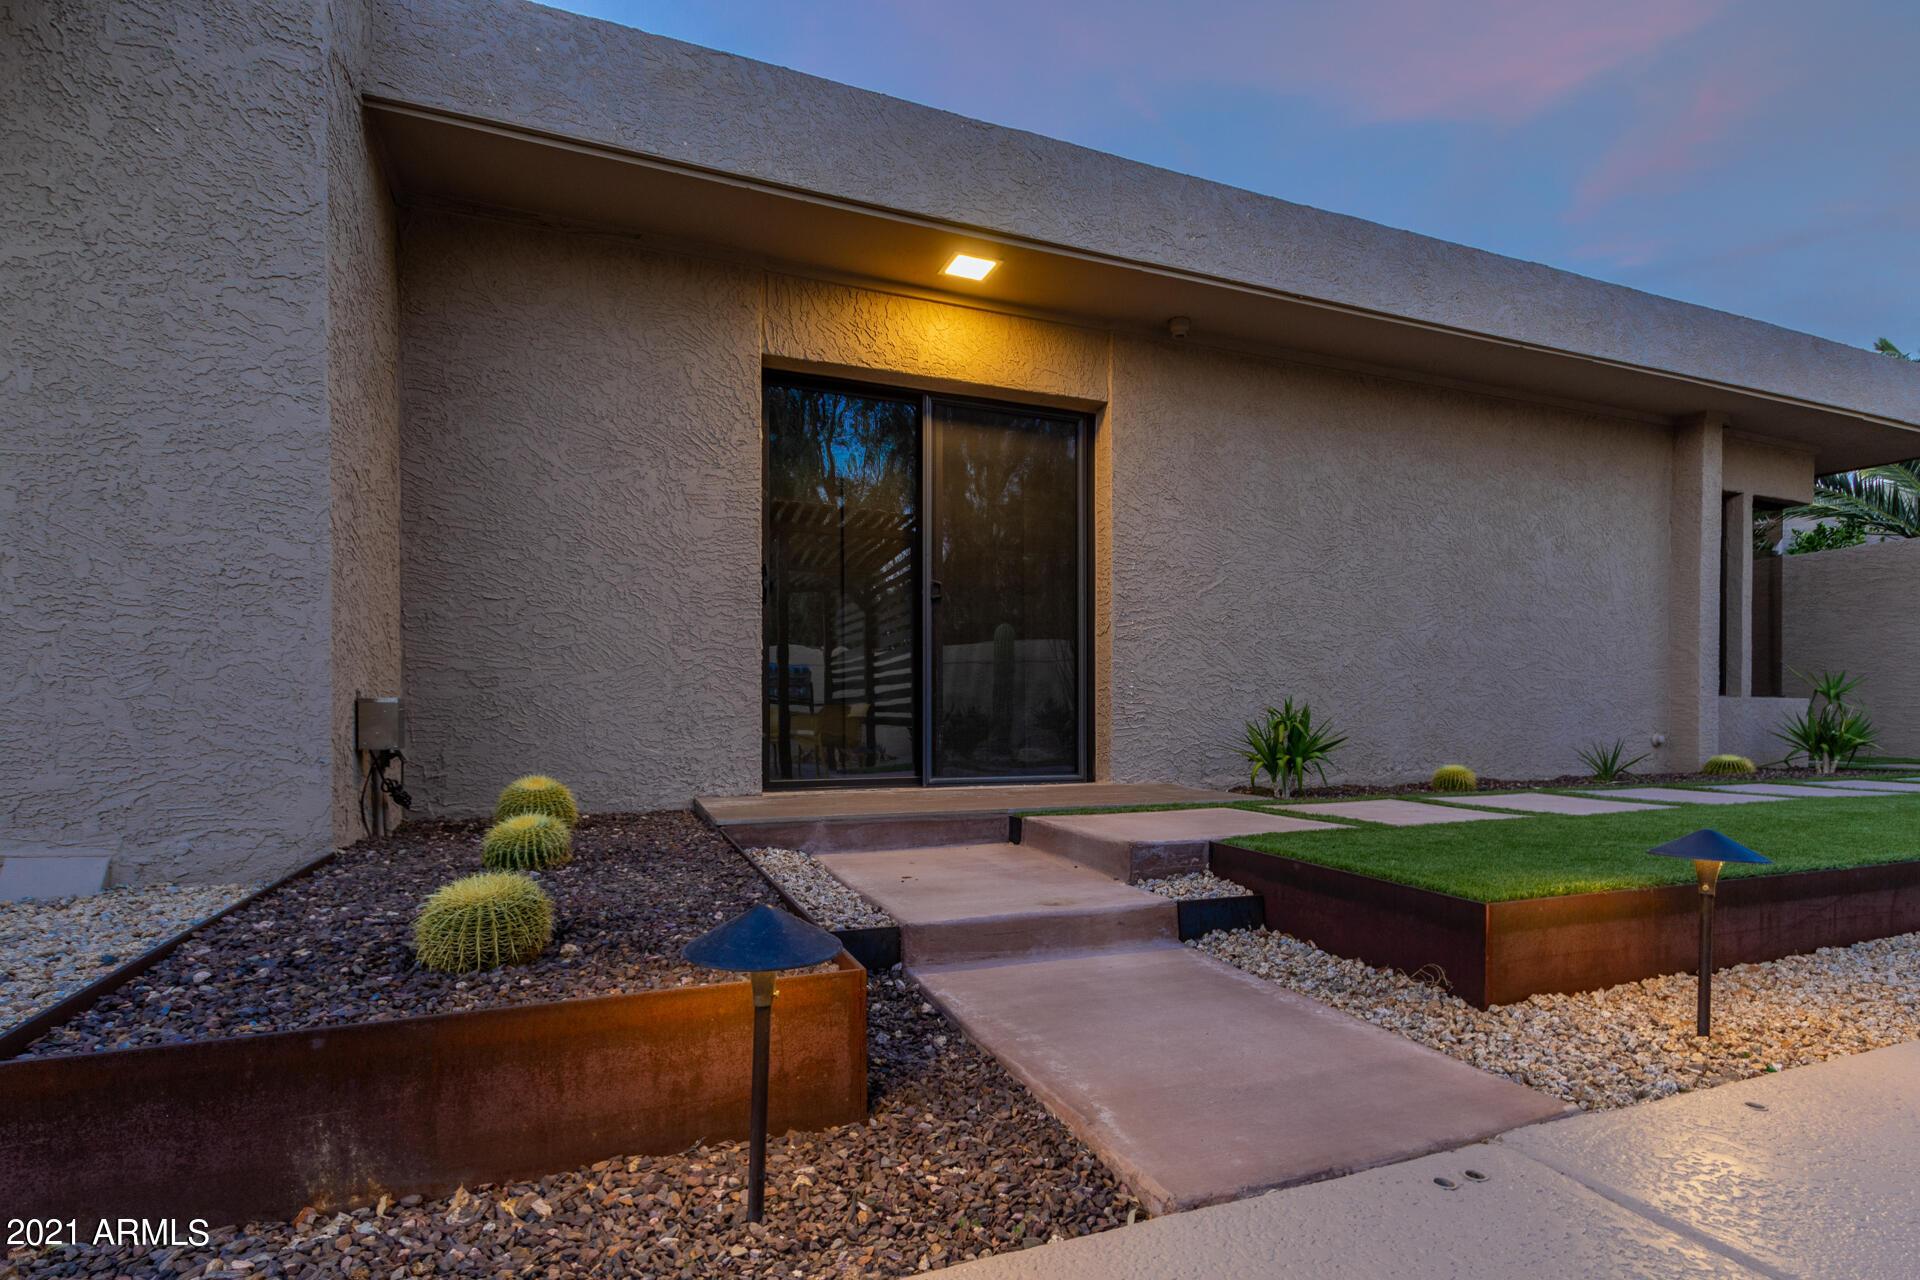 DEL TIBURON Drive, Scottsdale, Arizona 85258, 4 Bedrooms Bedrooms, ,4 BathroomsBathrooms,Residential,For Sale,DEL TIBURON,6228350